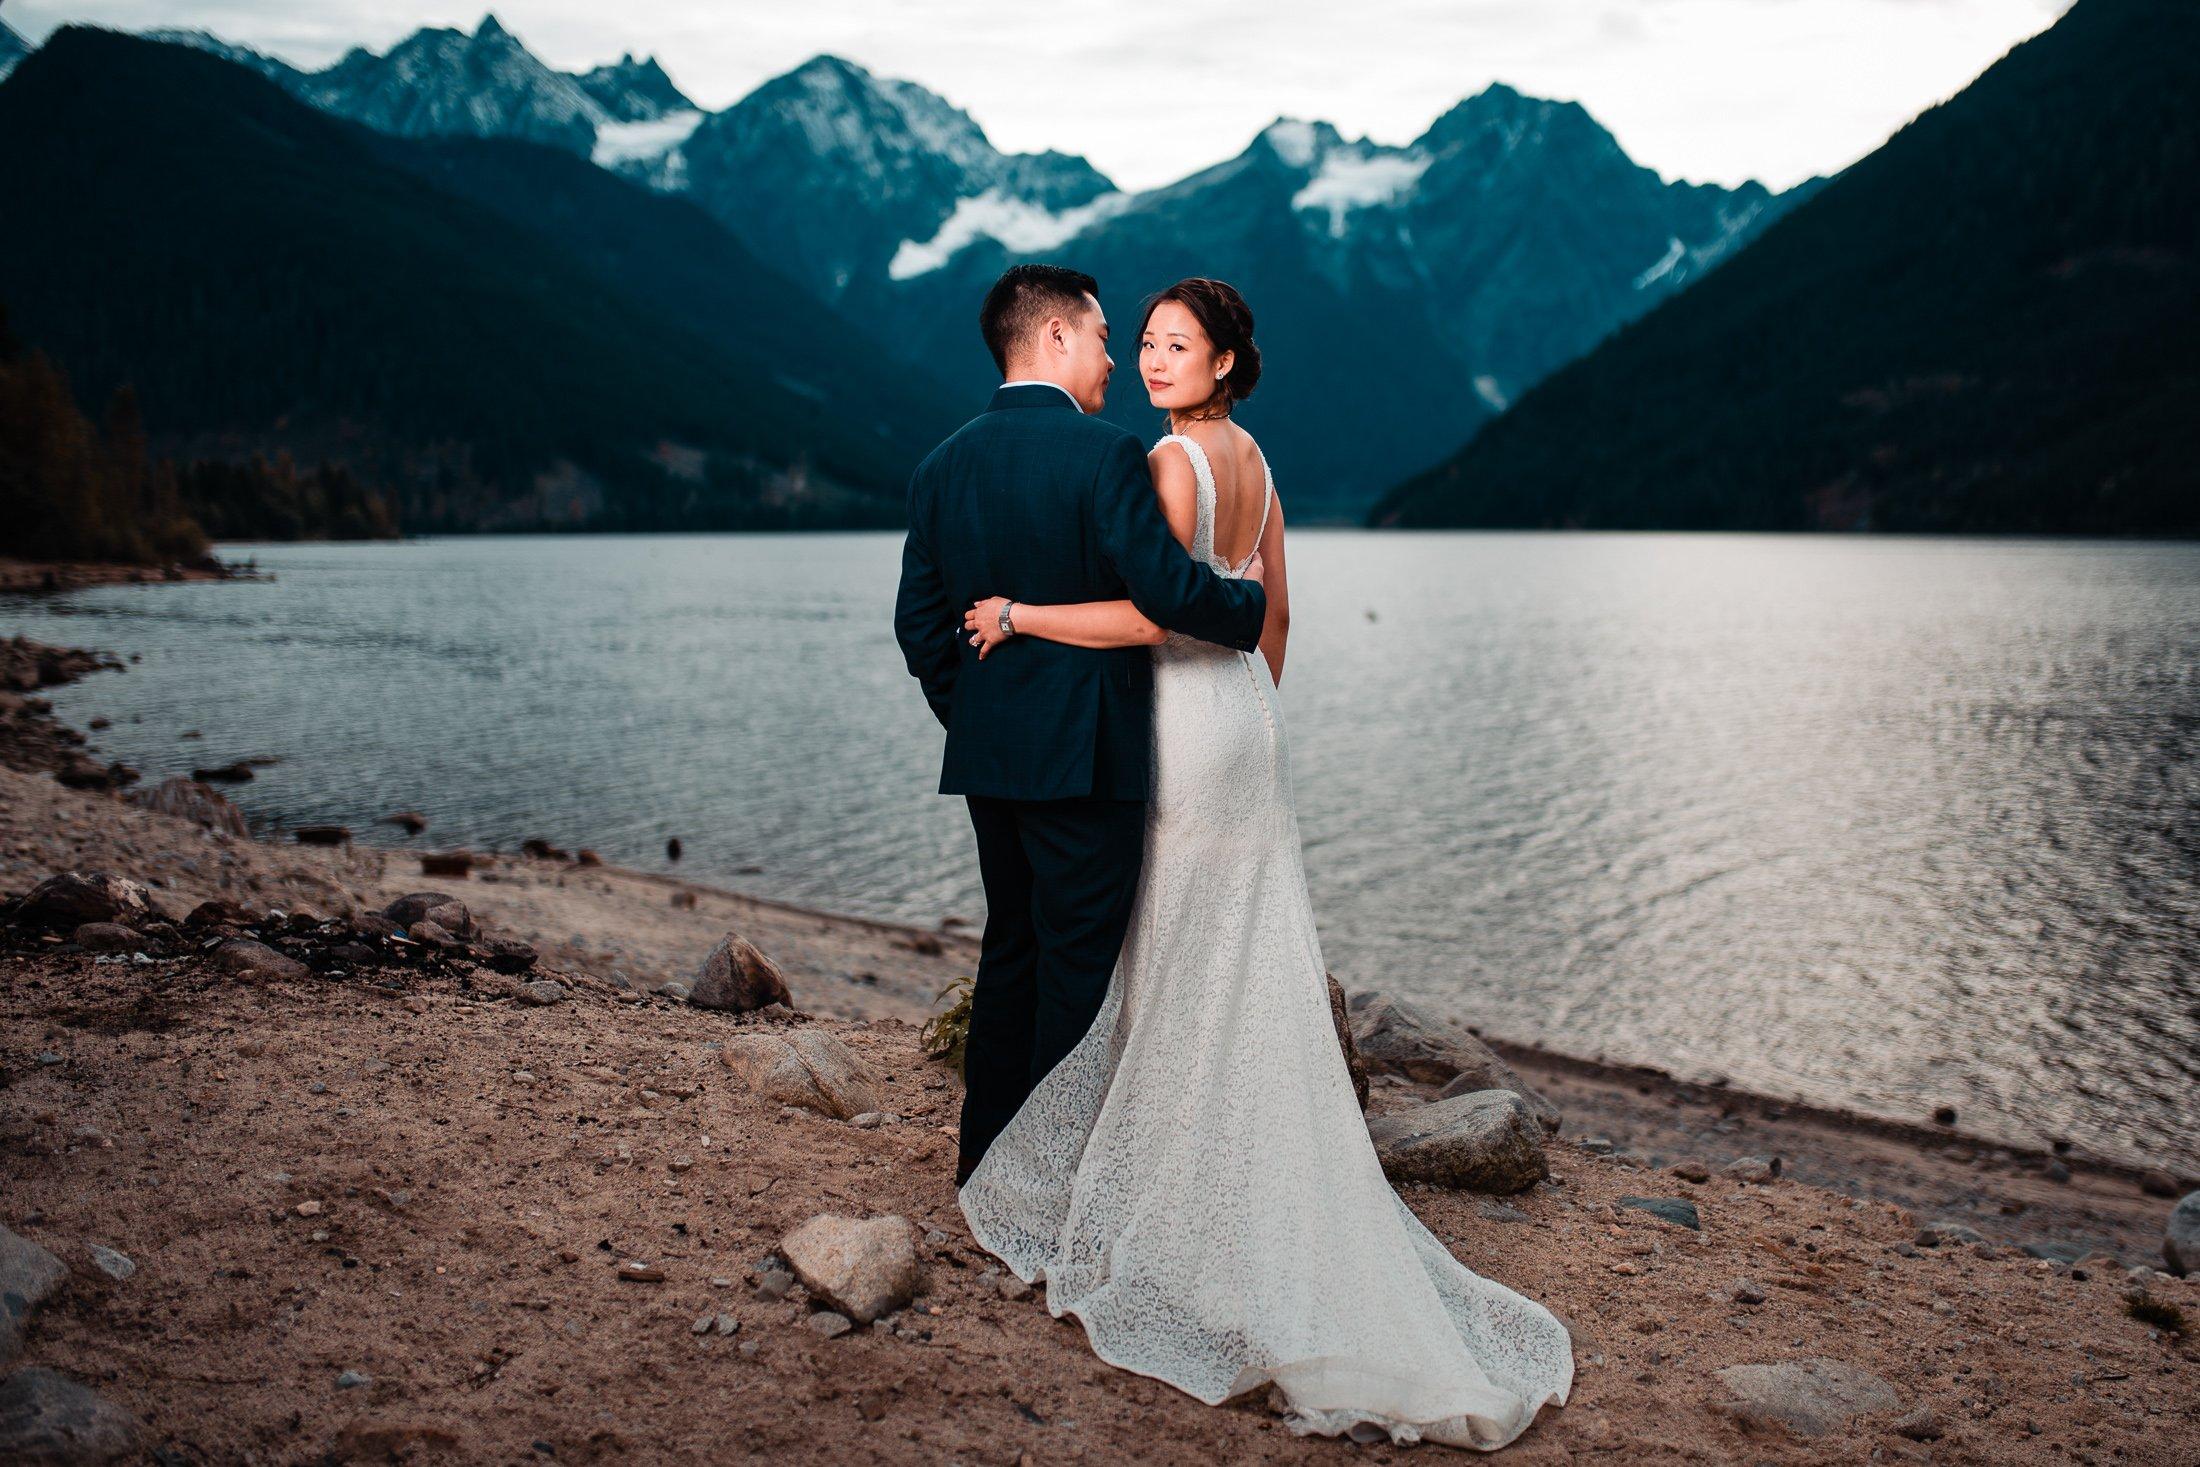 007 - mountain adventure elopement